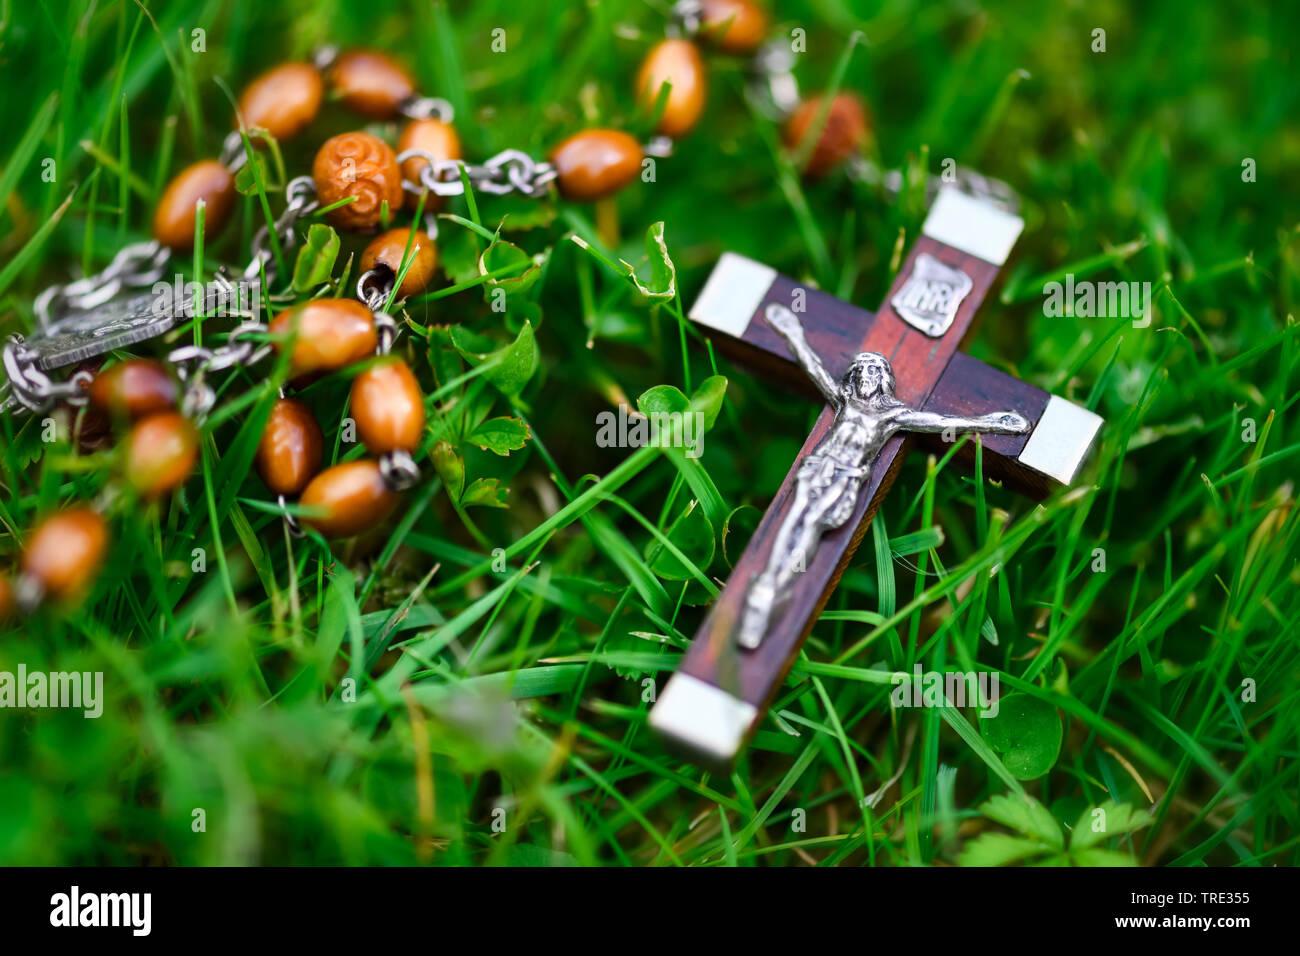 Kruzifix mit Rosenkranz liegt im Gras, Deutschland | crucifix lying in grass, Germany | BLWS515949.jpg [ (c) blickwinkel/McPHOTO/C. Ohde Tel. +49 (0)2 - Stock Image